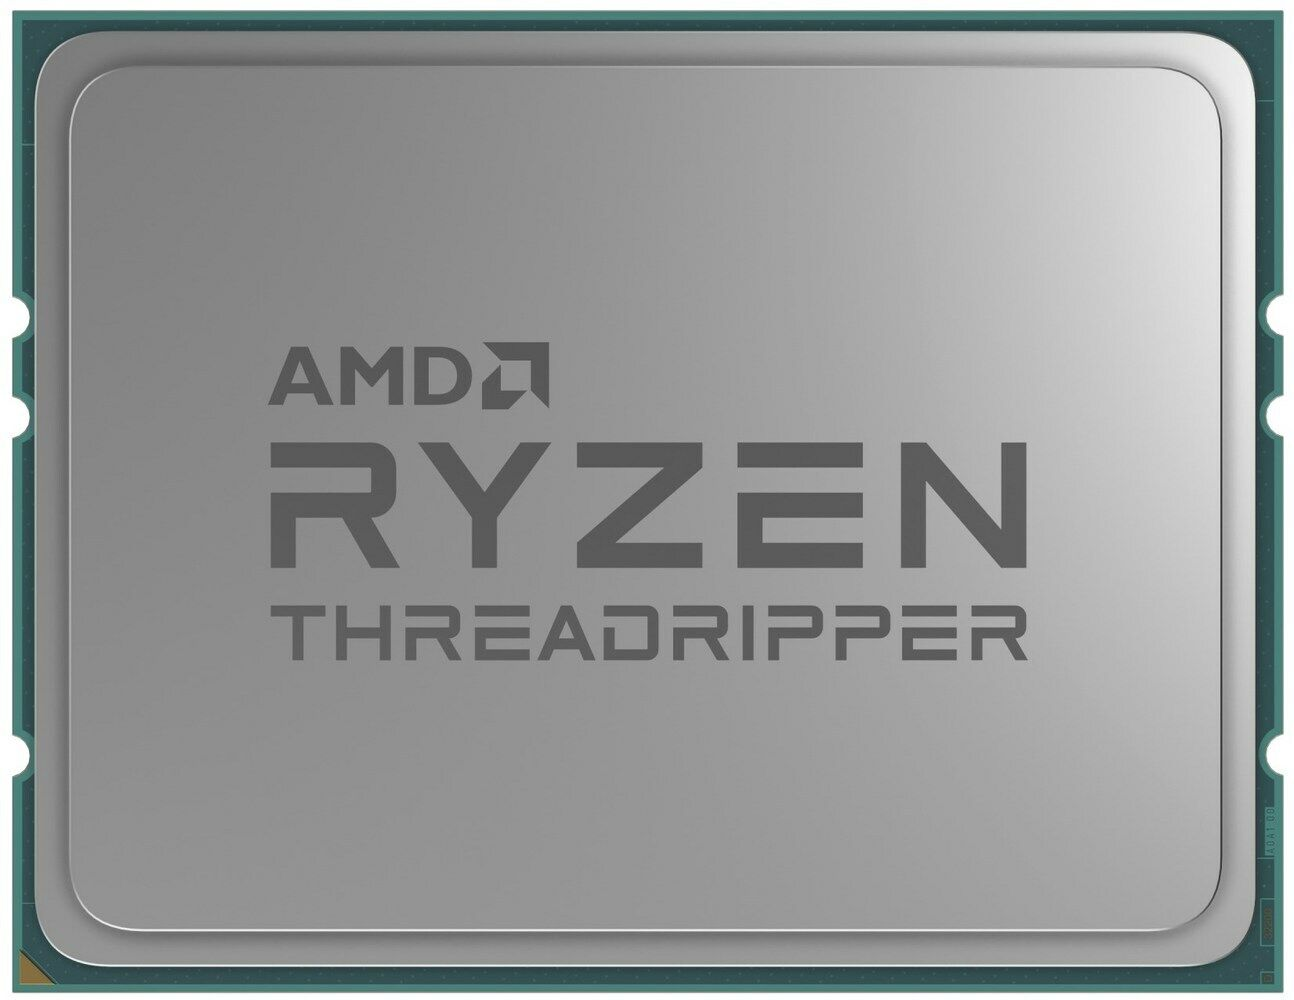 Alienware area jeux amd threadripper ryzen 128 gb ram 2 tb ssd nvidia rtx 3090